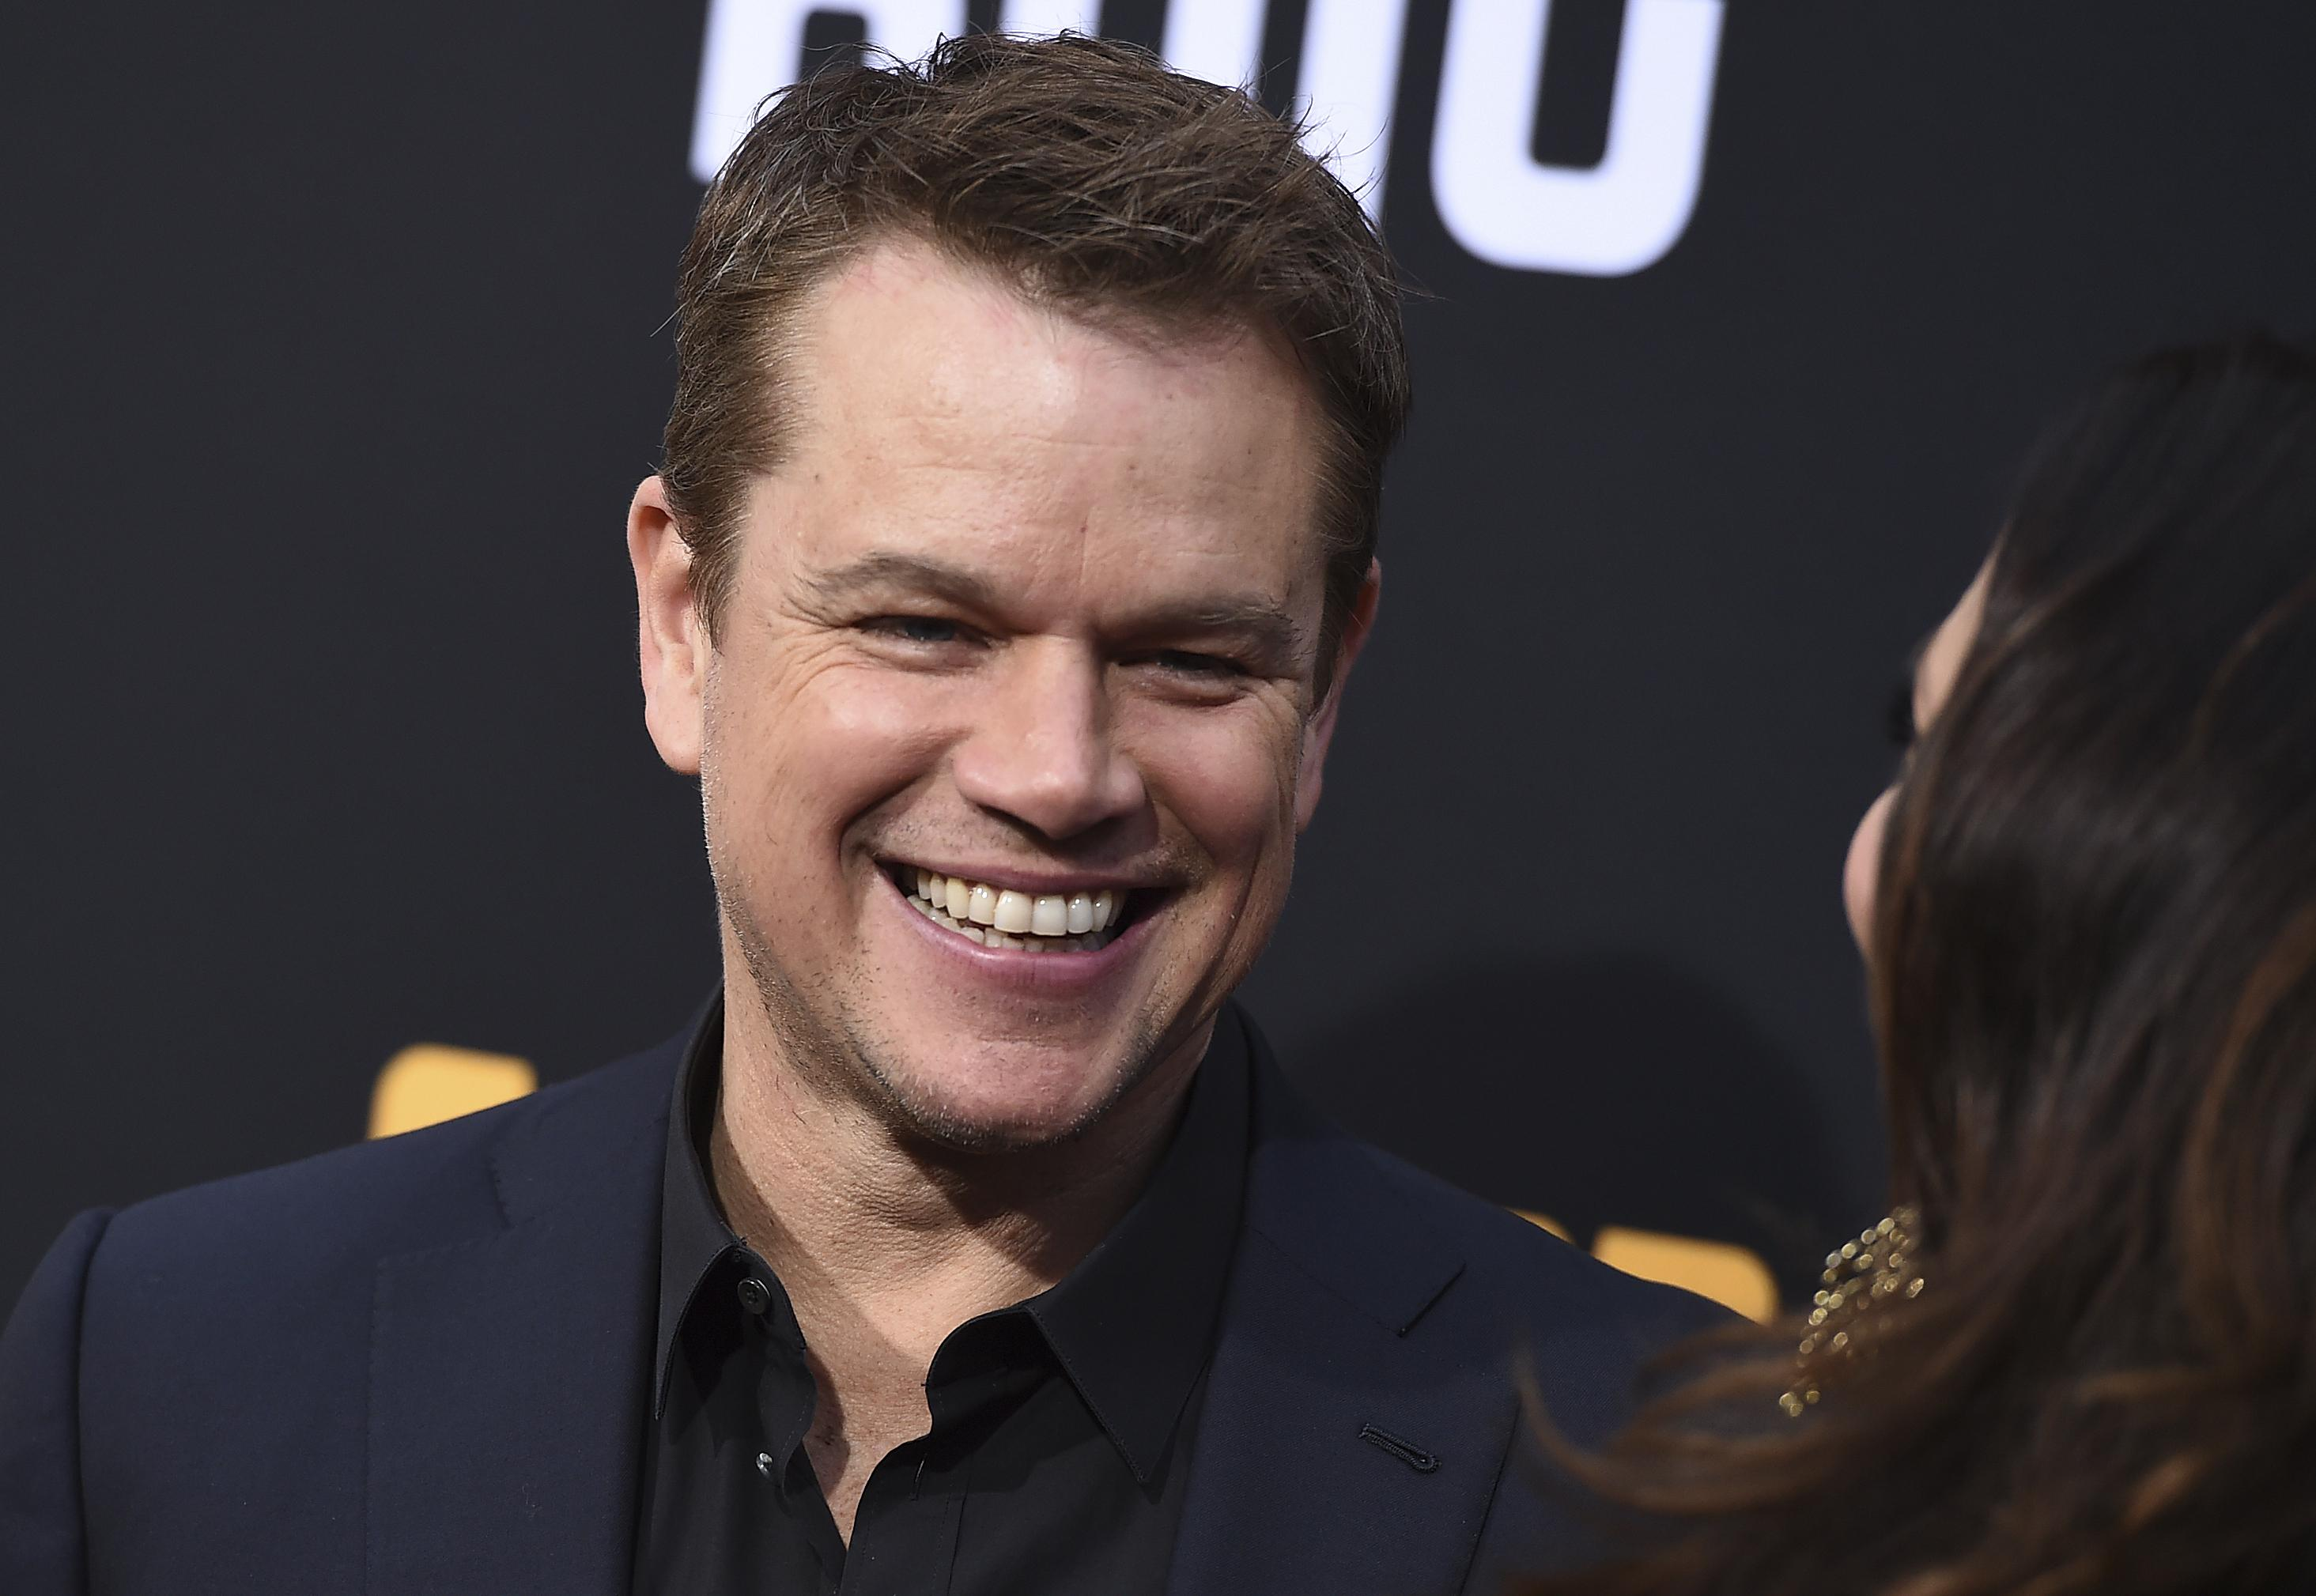 Matt Damon, Christian Bale to serve as Indy 500 starters